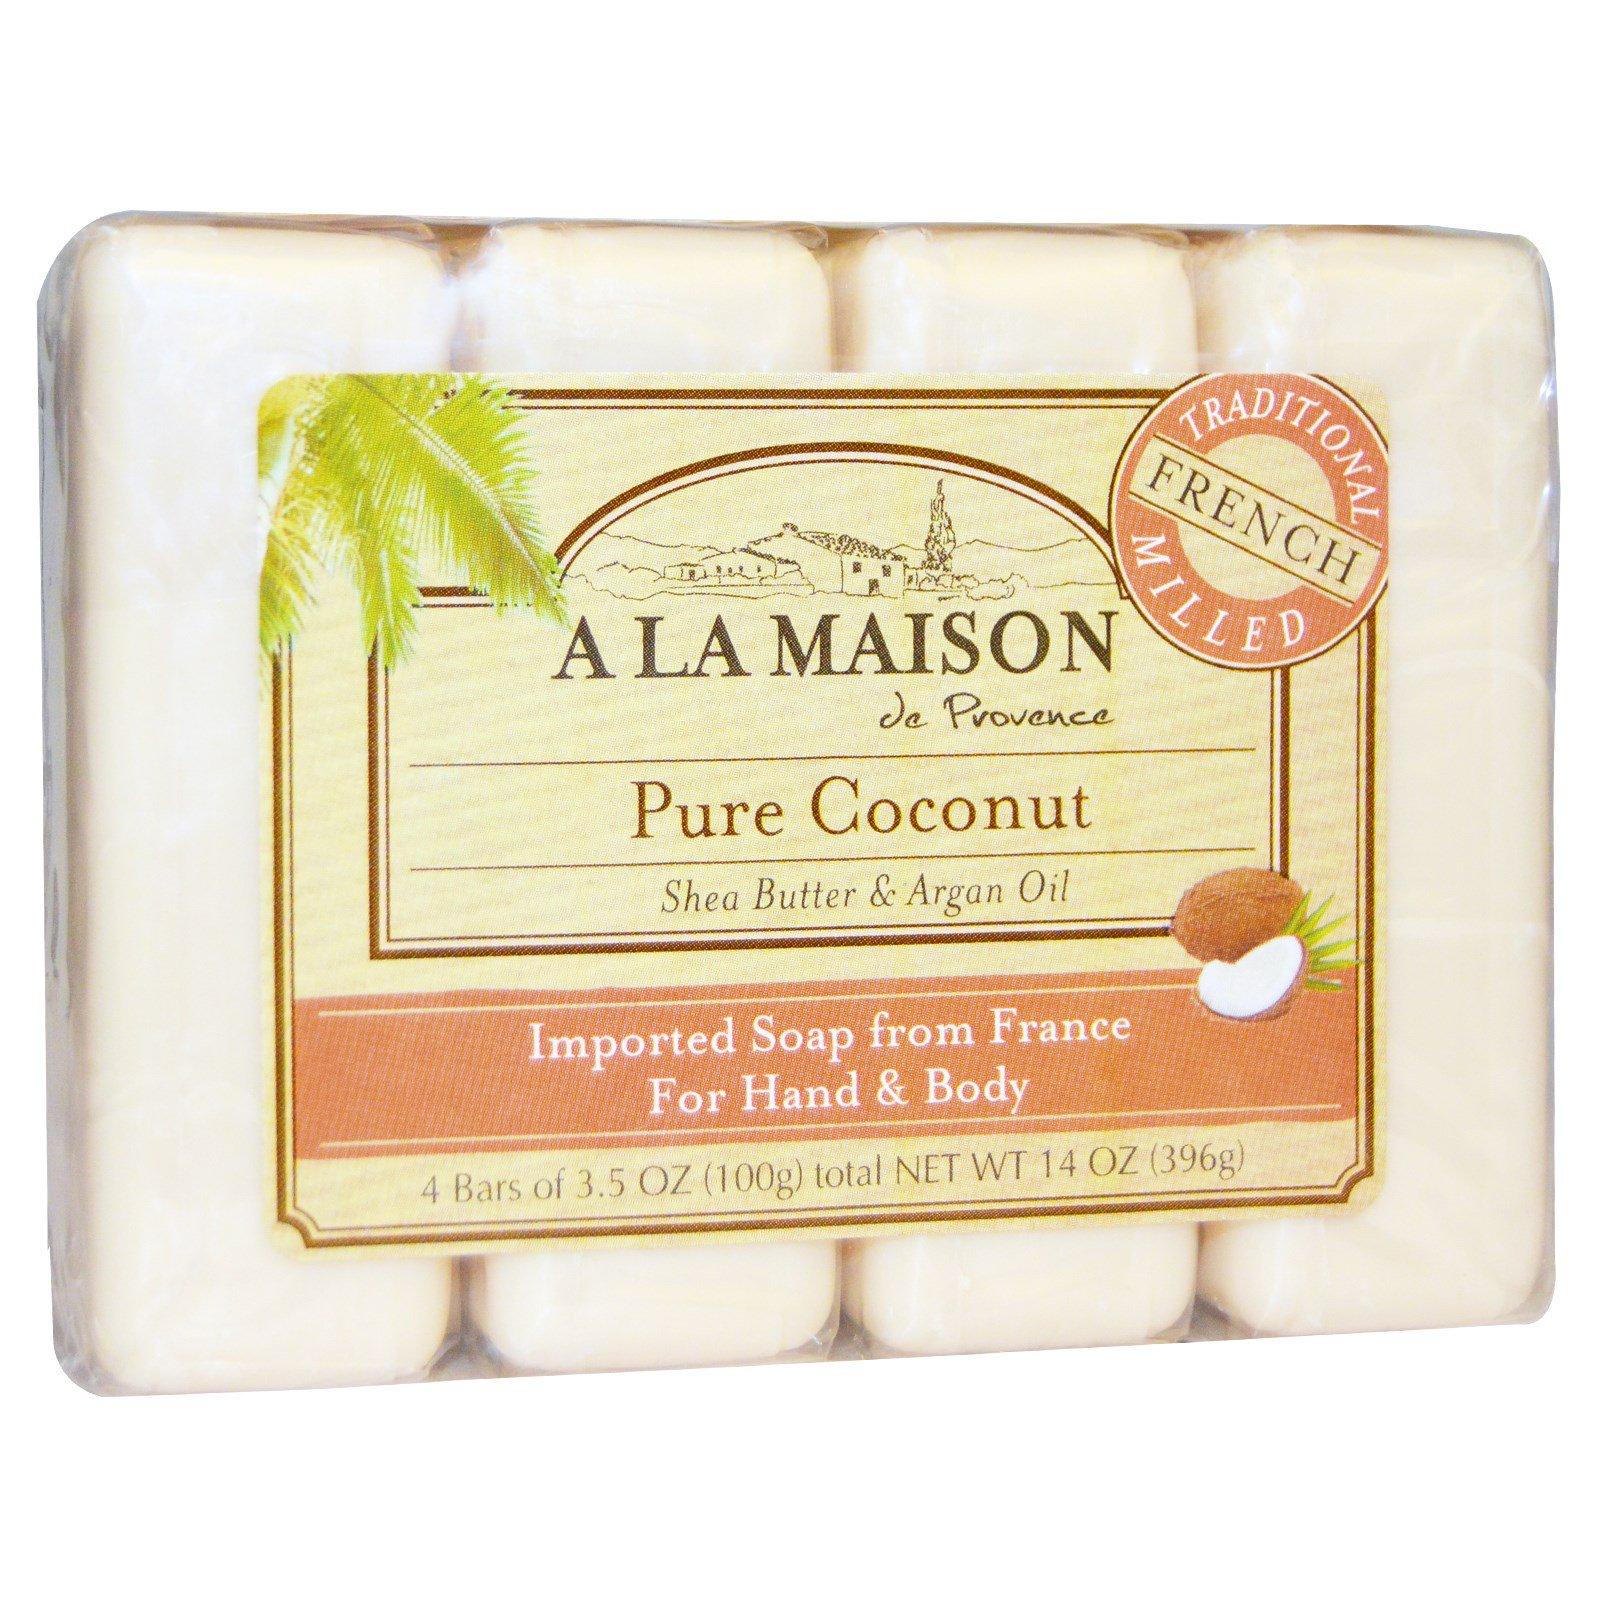 A La Maison de Provence, Hand & Body Bar Soap, Pure Coconut, 4 Bars